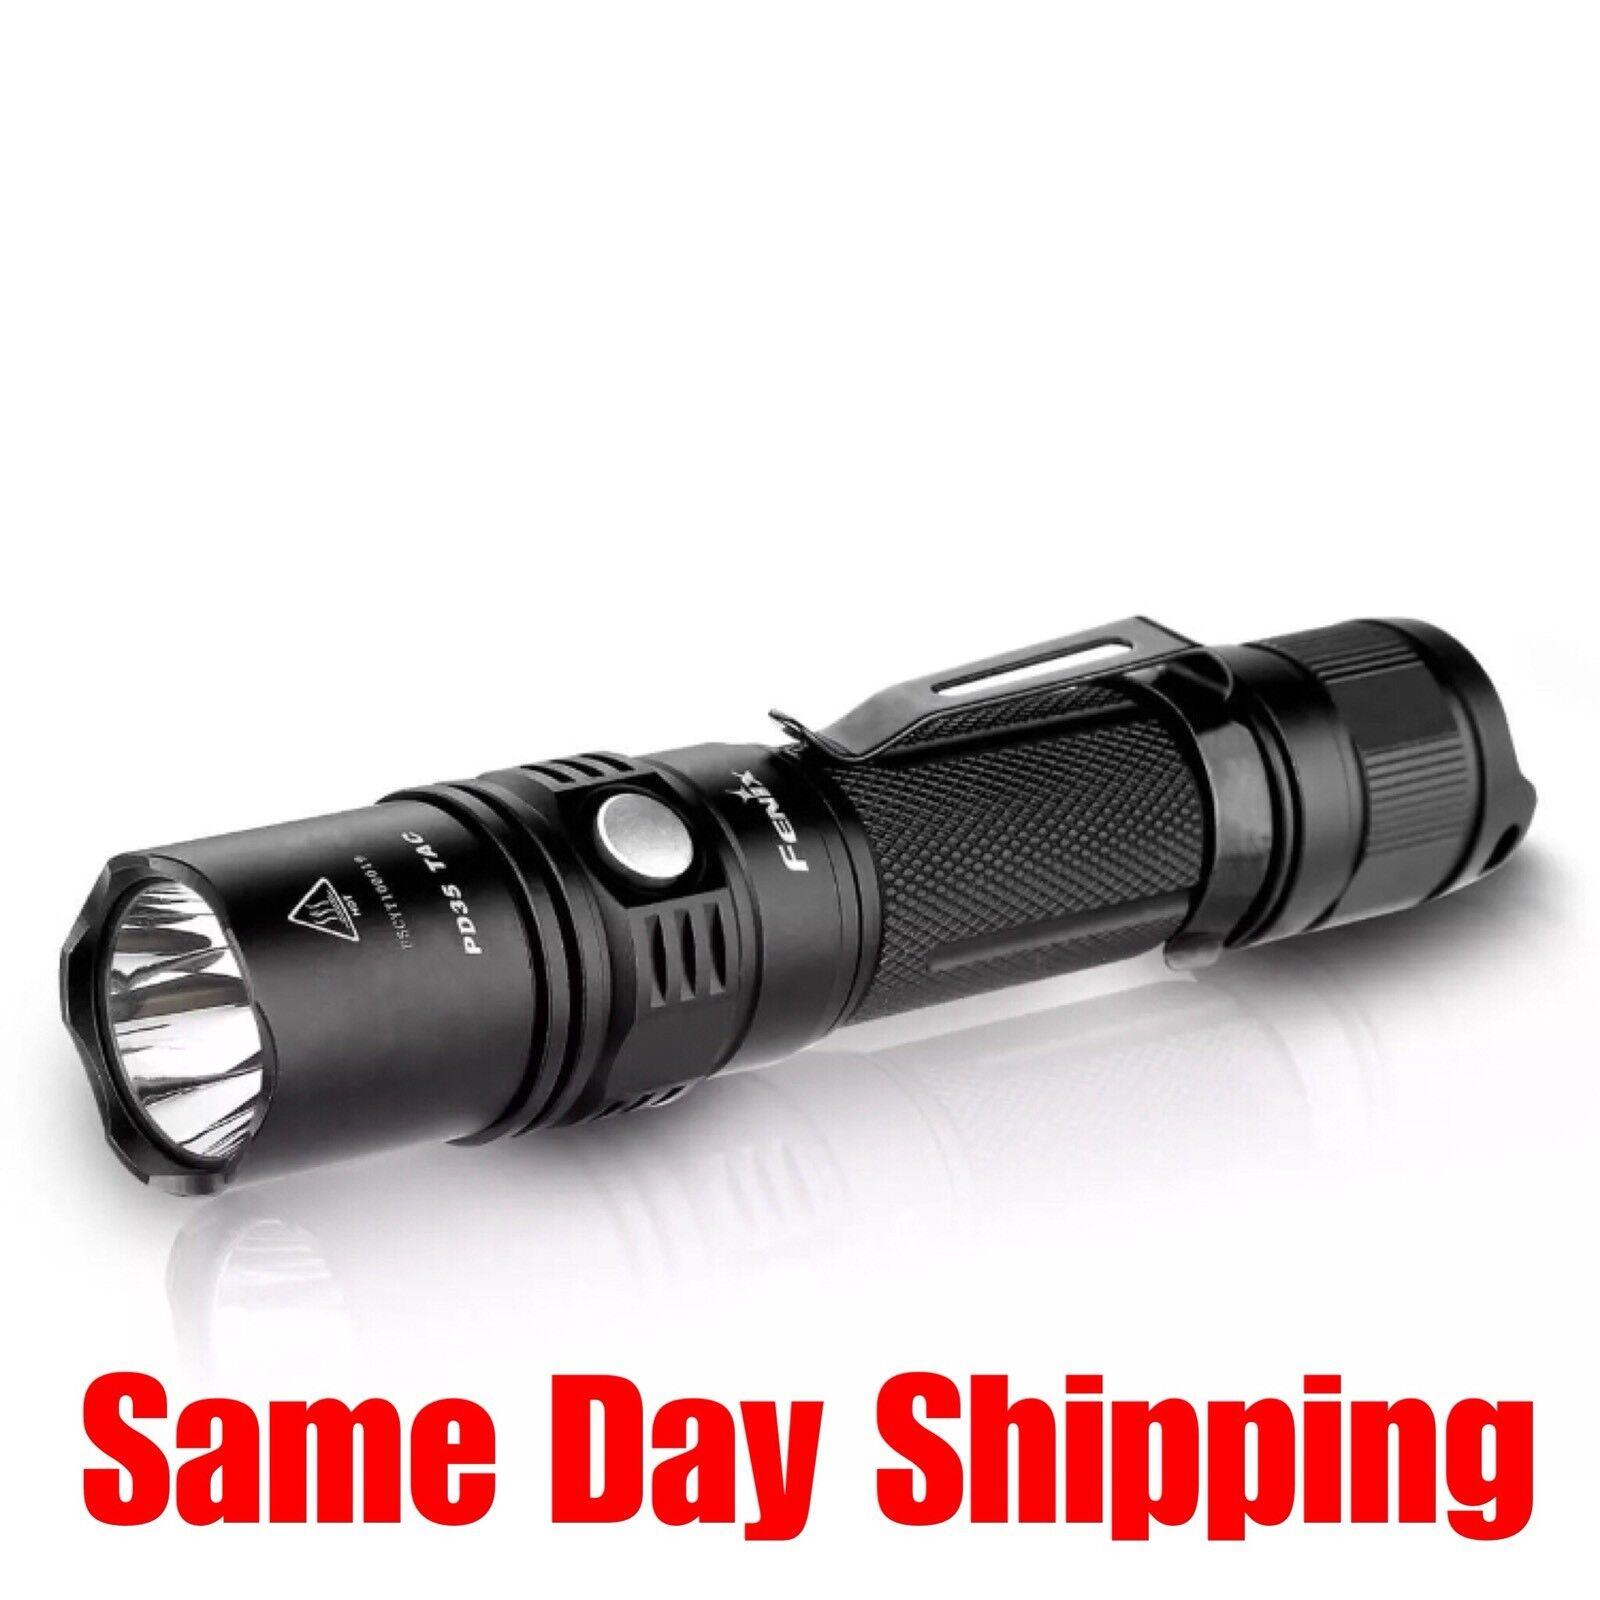 Fenix Flashlight PD35TAC Tactical Edition 1000 Lumen Stainless Steel FX-PD35TAC